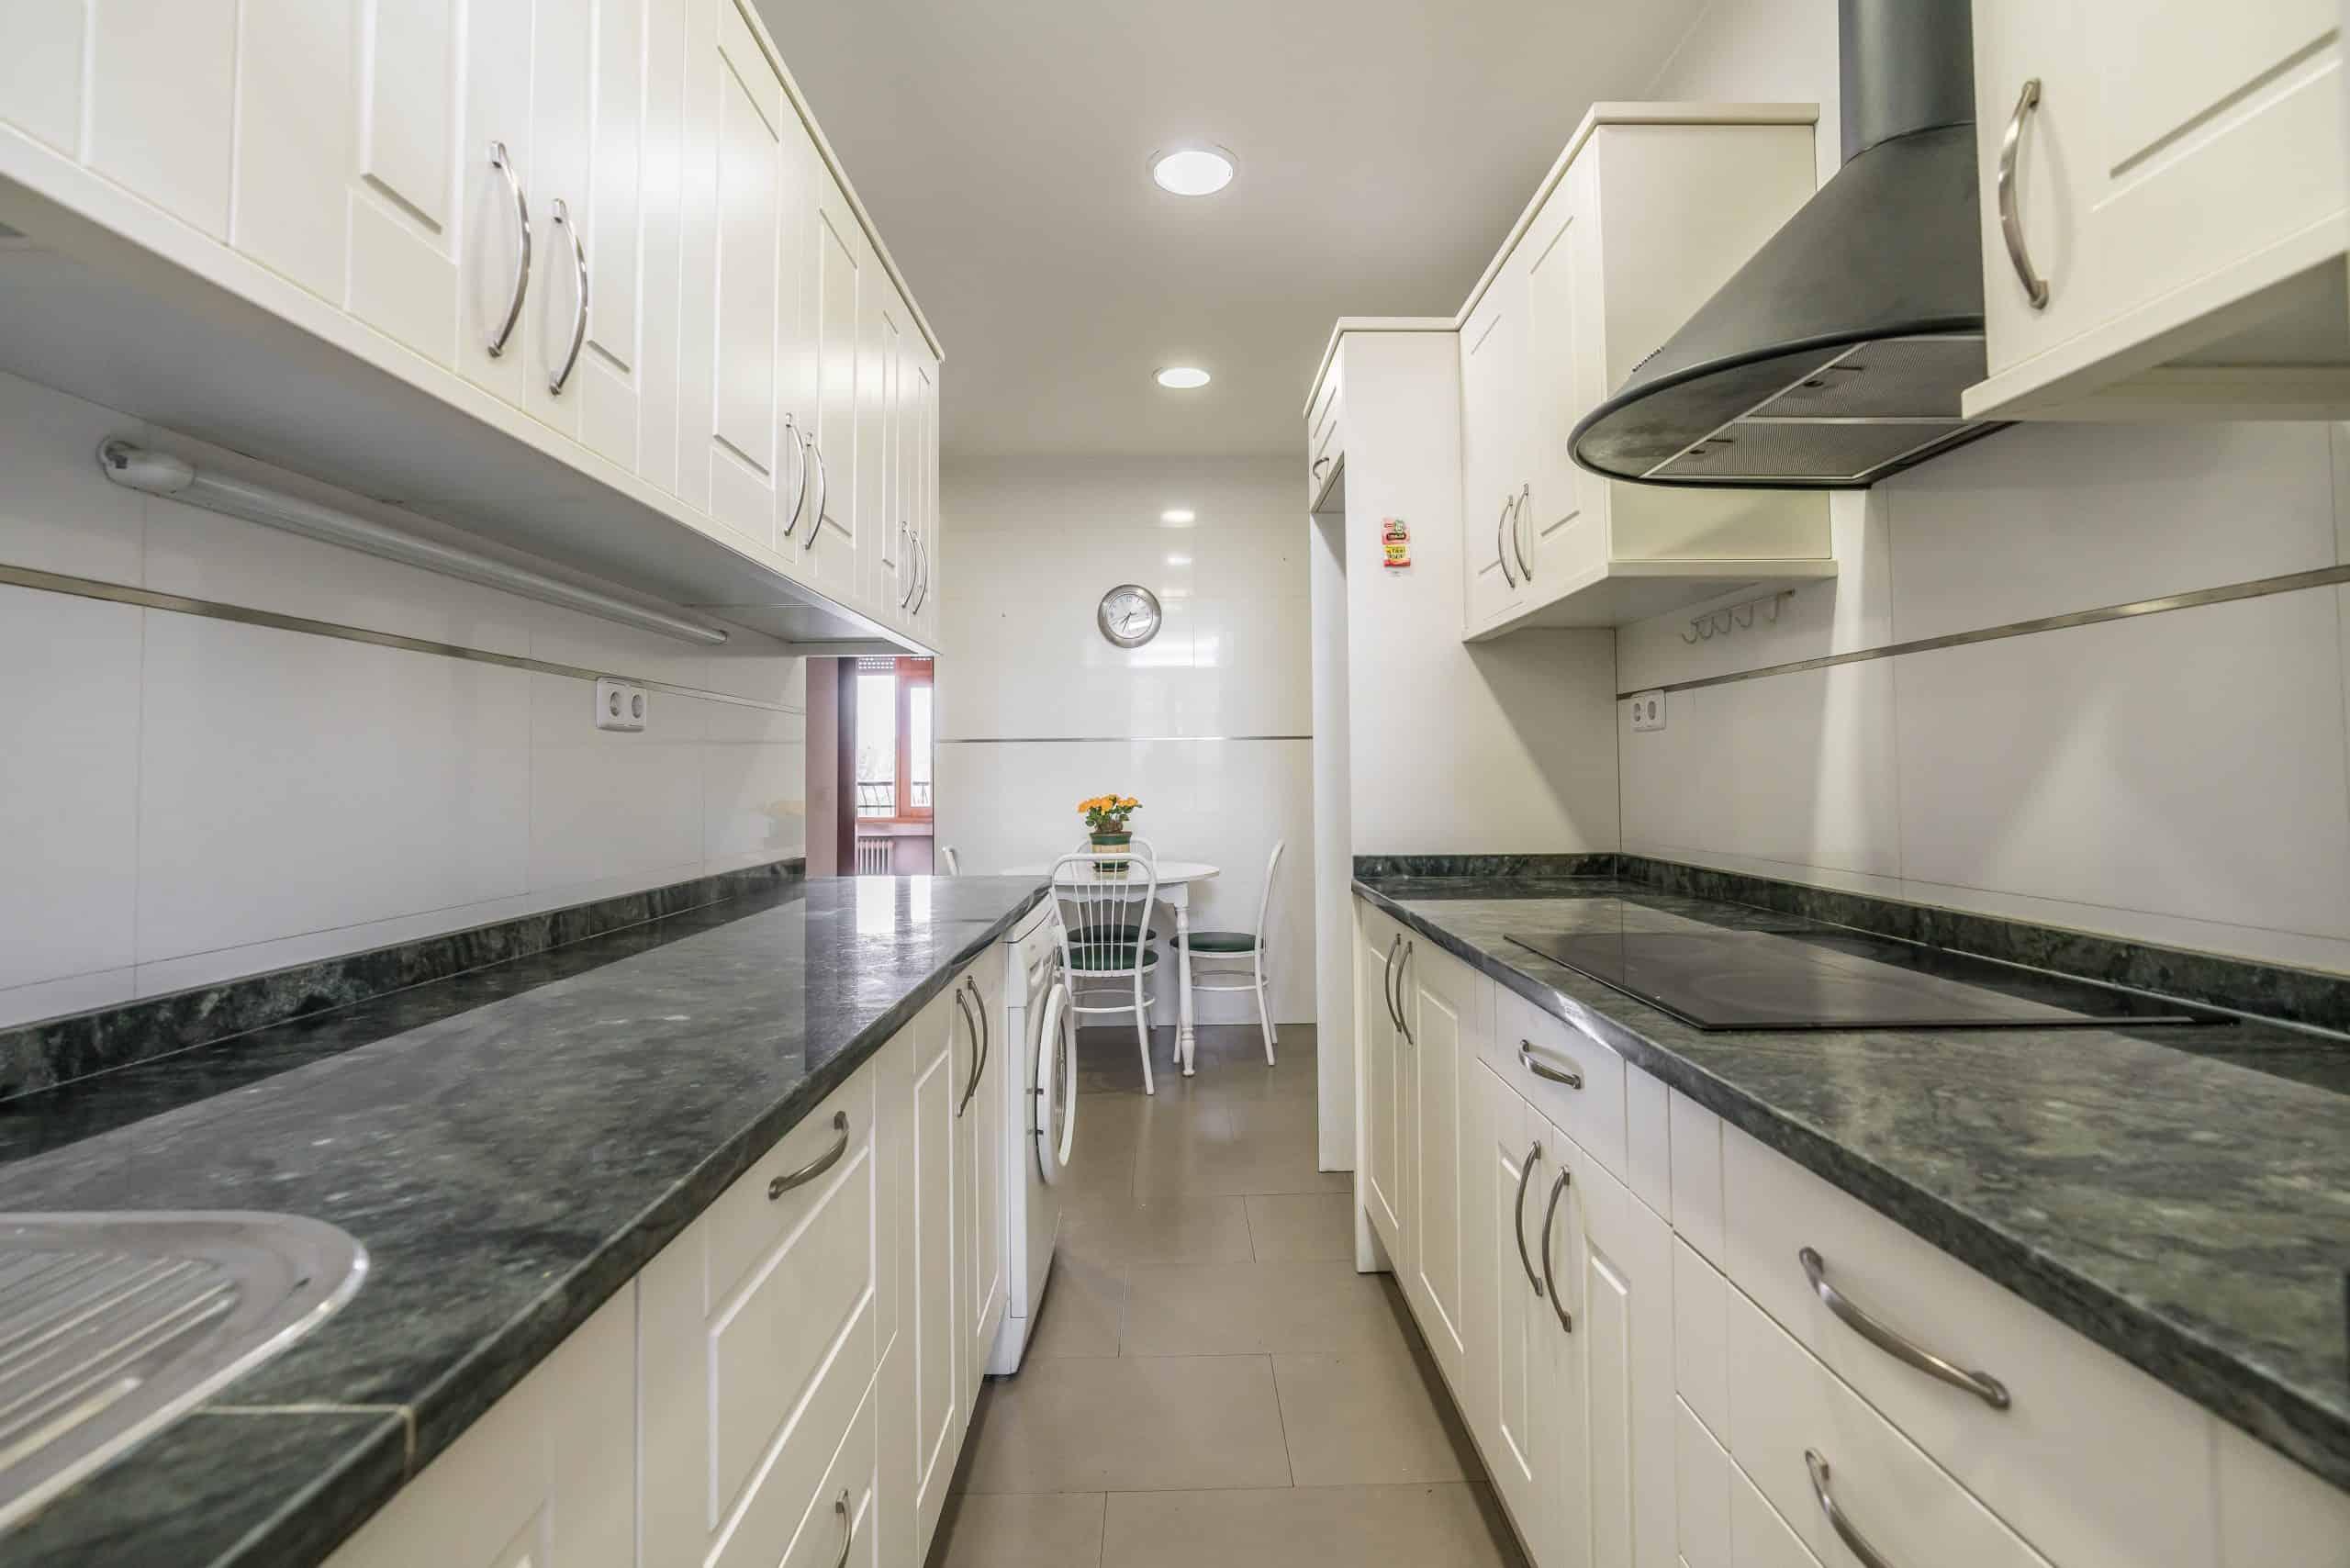 Agencia Inmobiliaria de Madrid-FUTUROCASA-Zona ARGANZUELA-EMBAJADORES-LEGAZPI -calle Embajadores- baño 147